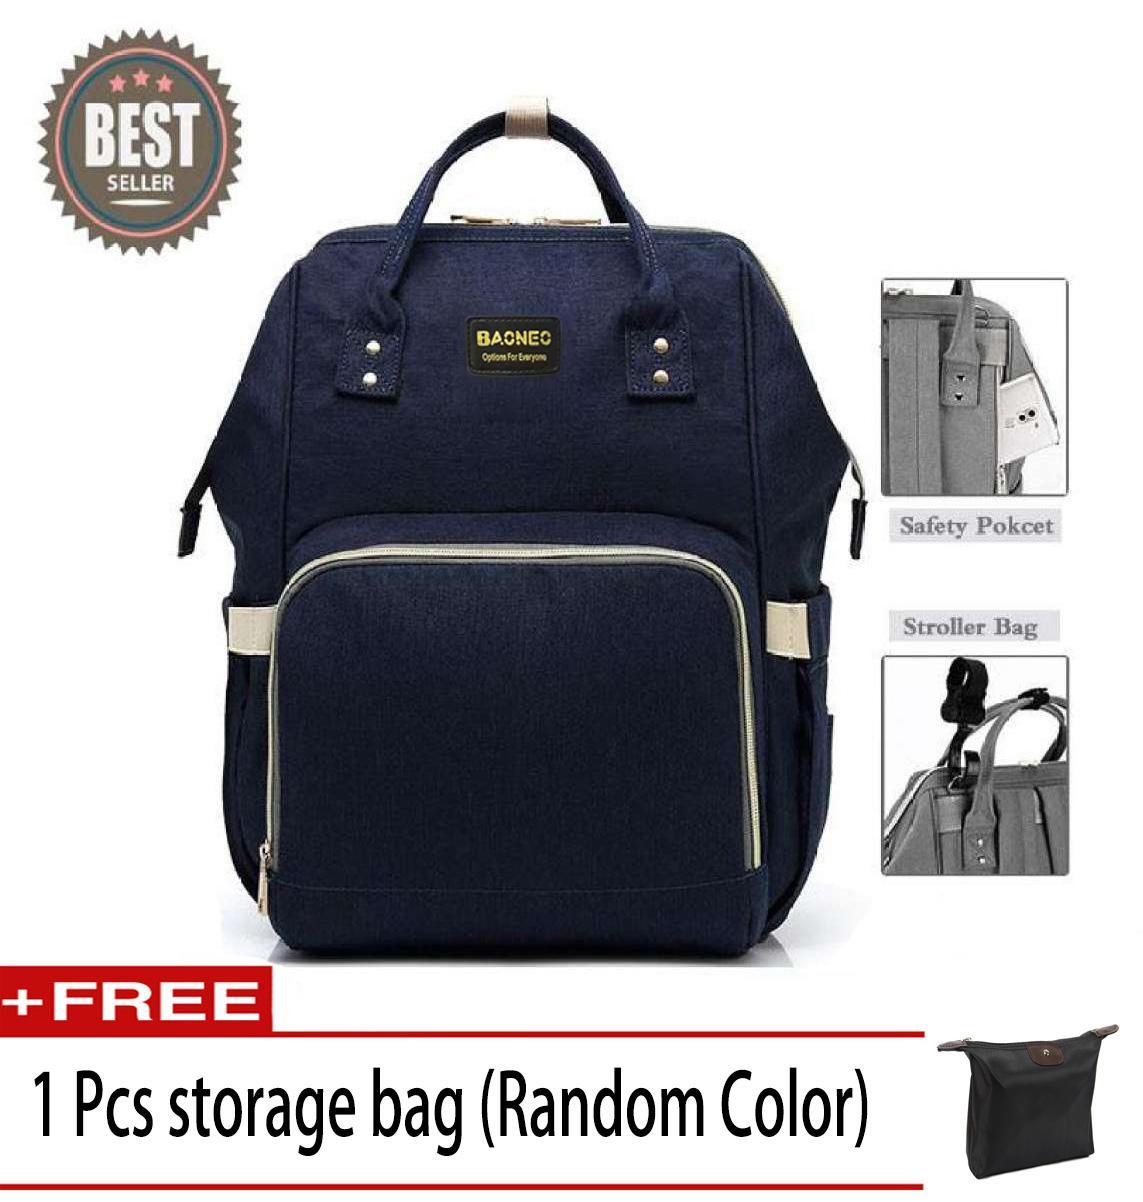 056c13316 Fashion Mummy Maternity Nappy Bag Brand Large Capacity Baby Bag Travel  Backpack Desinger Nursing Bag for